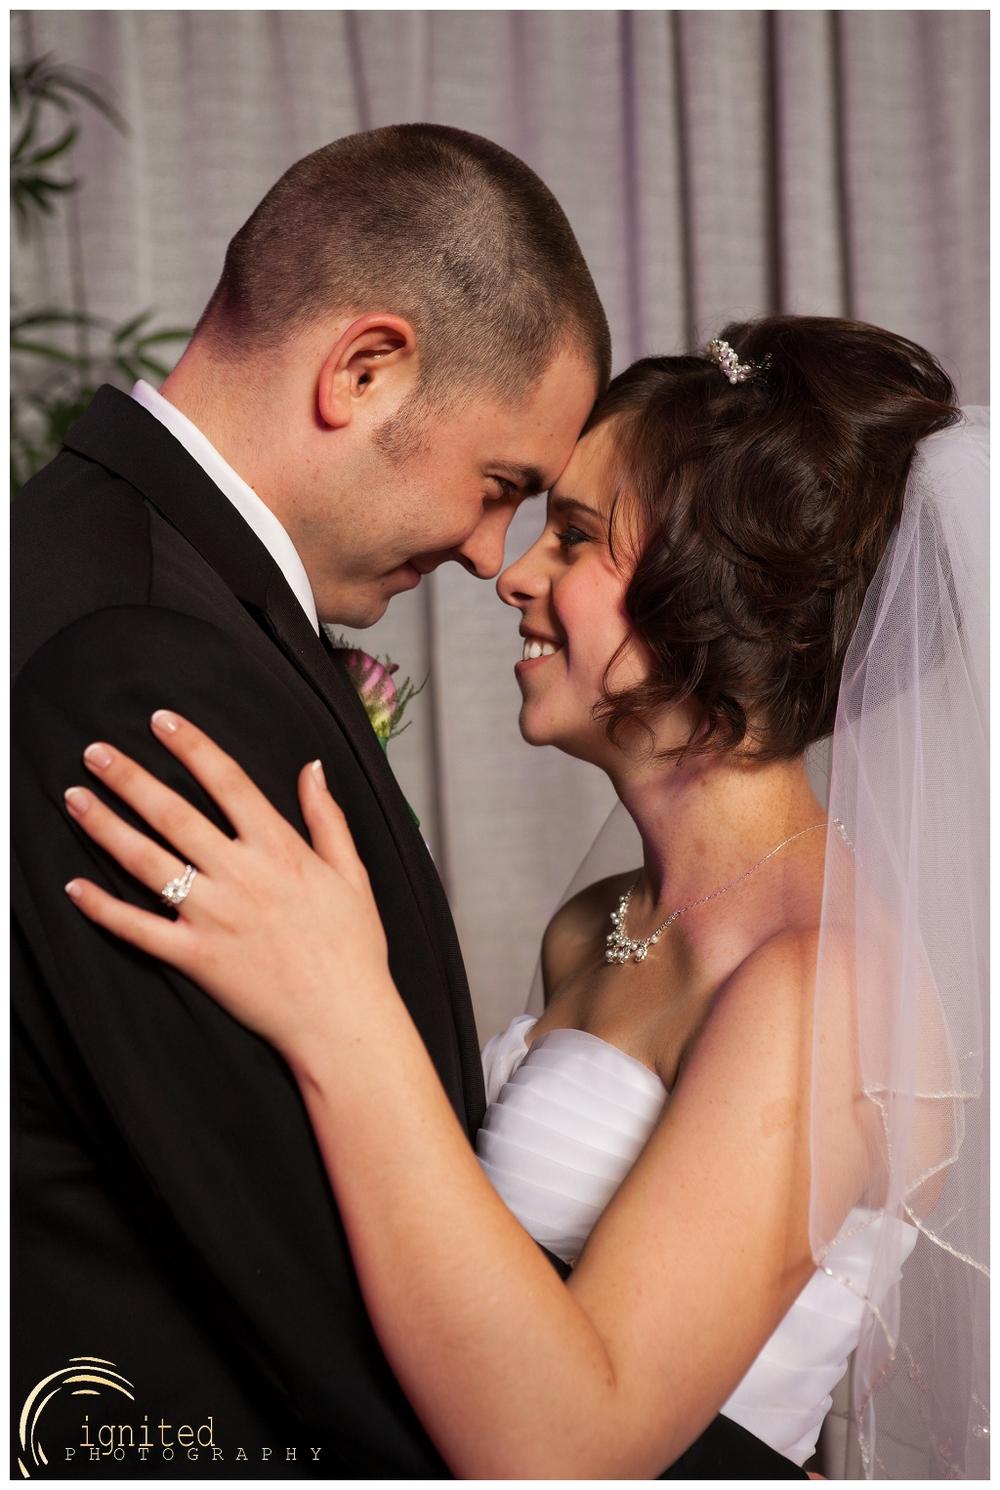 ignited Photography Alyssa  Castwell and Caleb Merna Wedding Brighton Nazarene The Naz Howell MI_0040.jpg